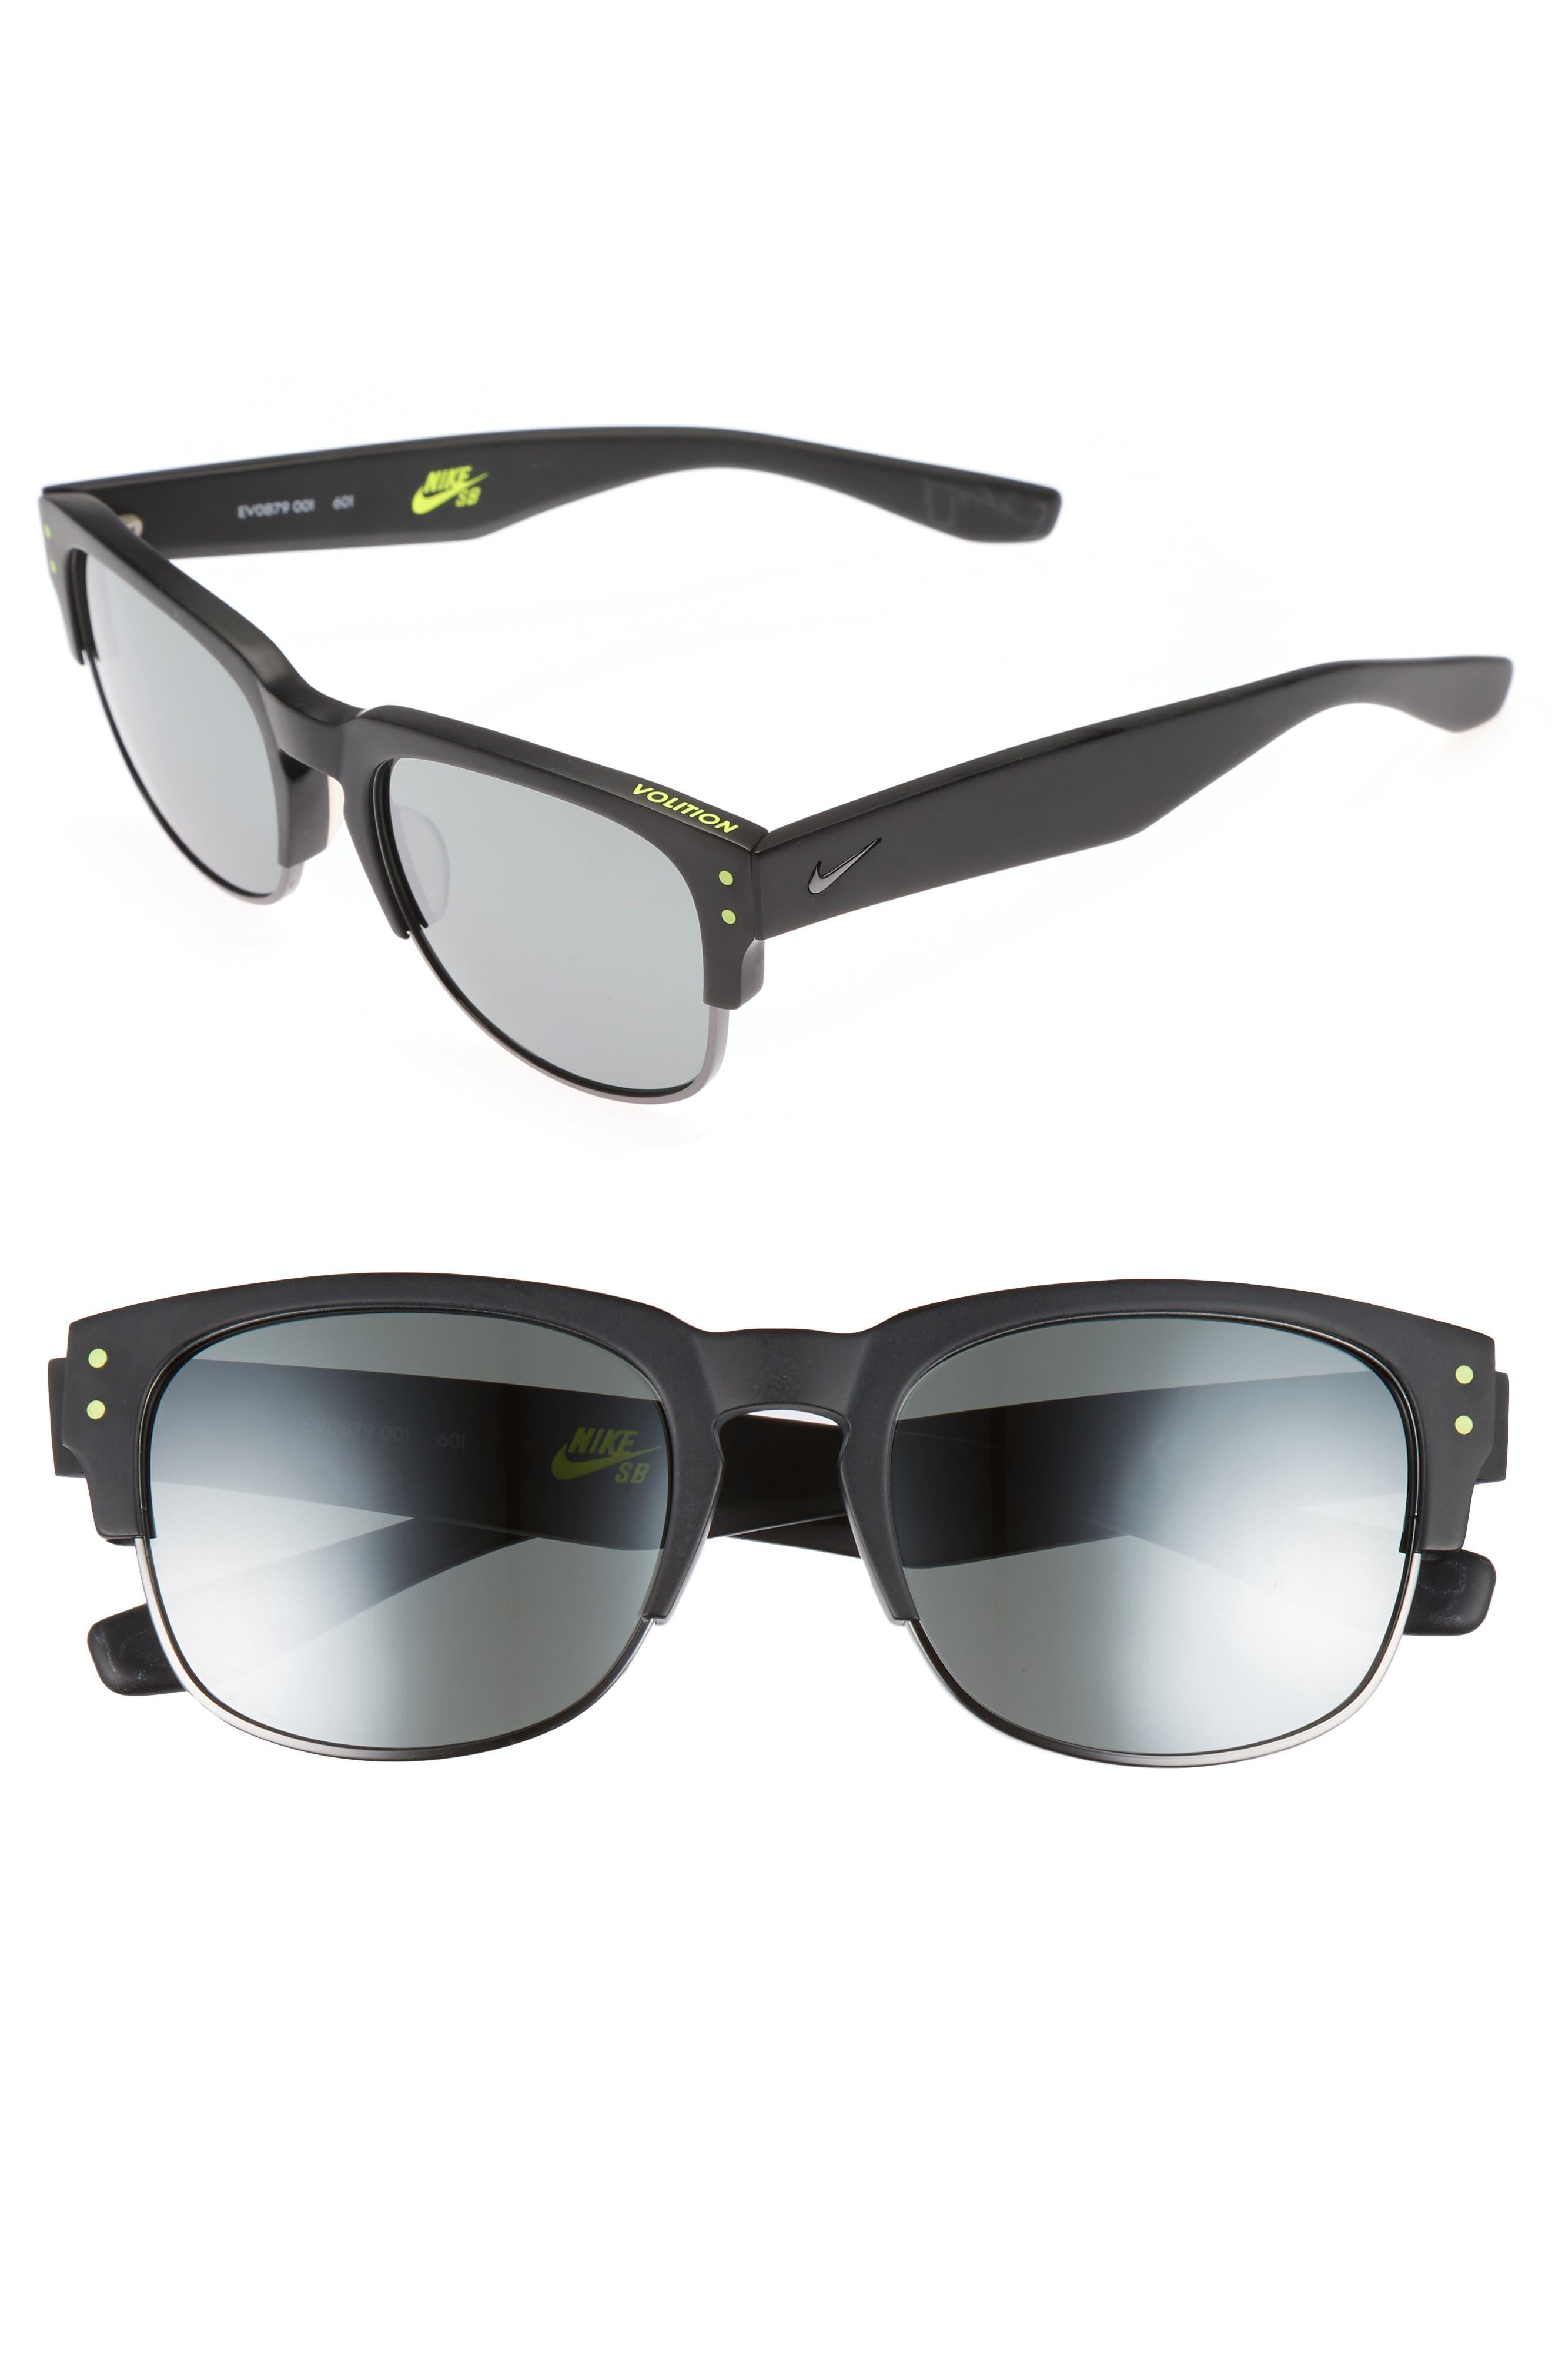 Volition 54mm Sunglasses,                             Main thumbnail 1, color,                             001